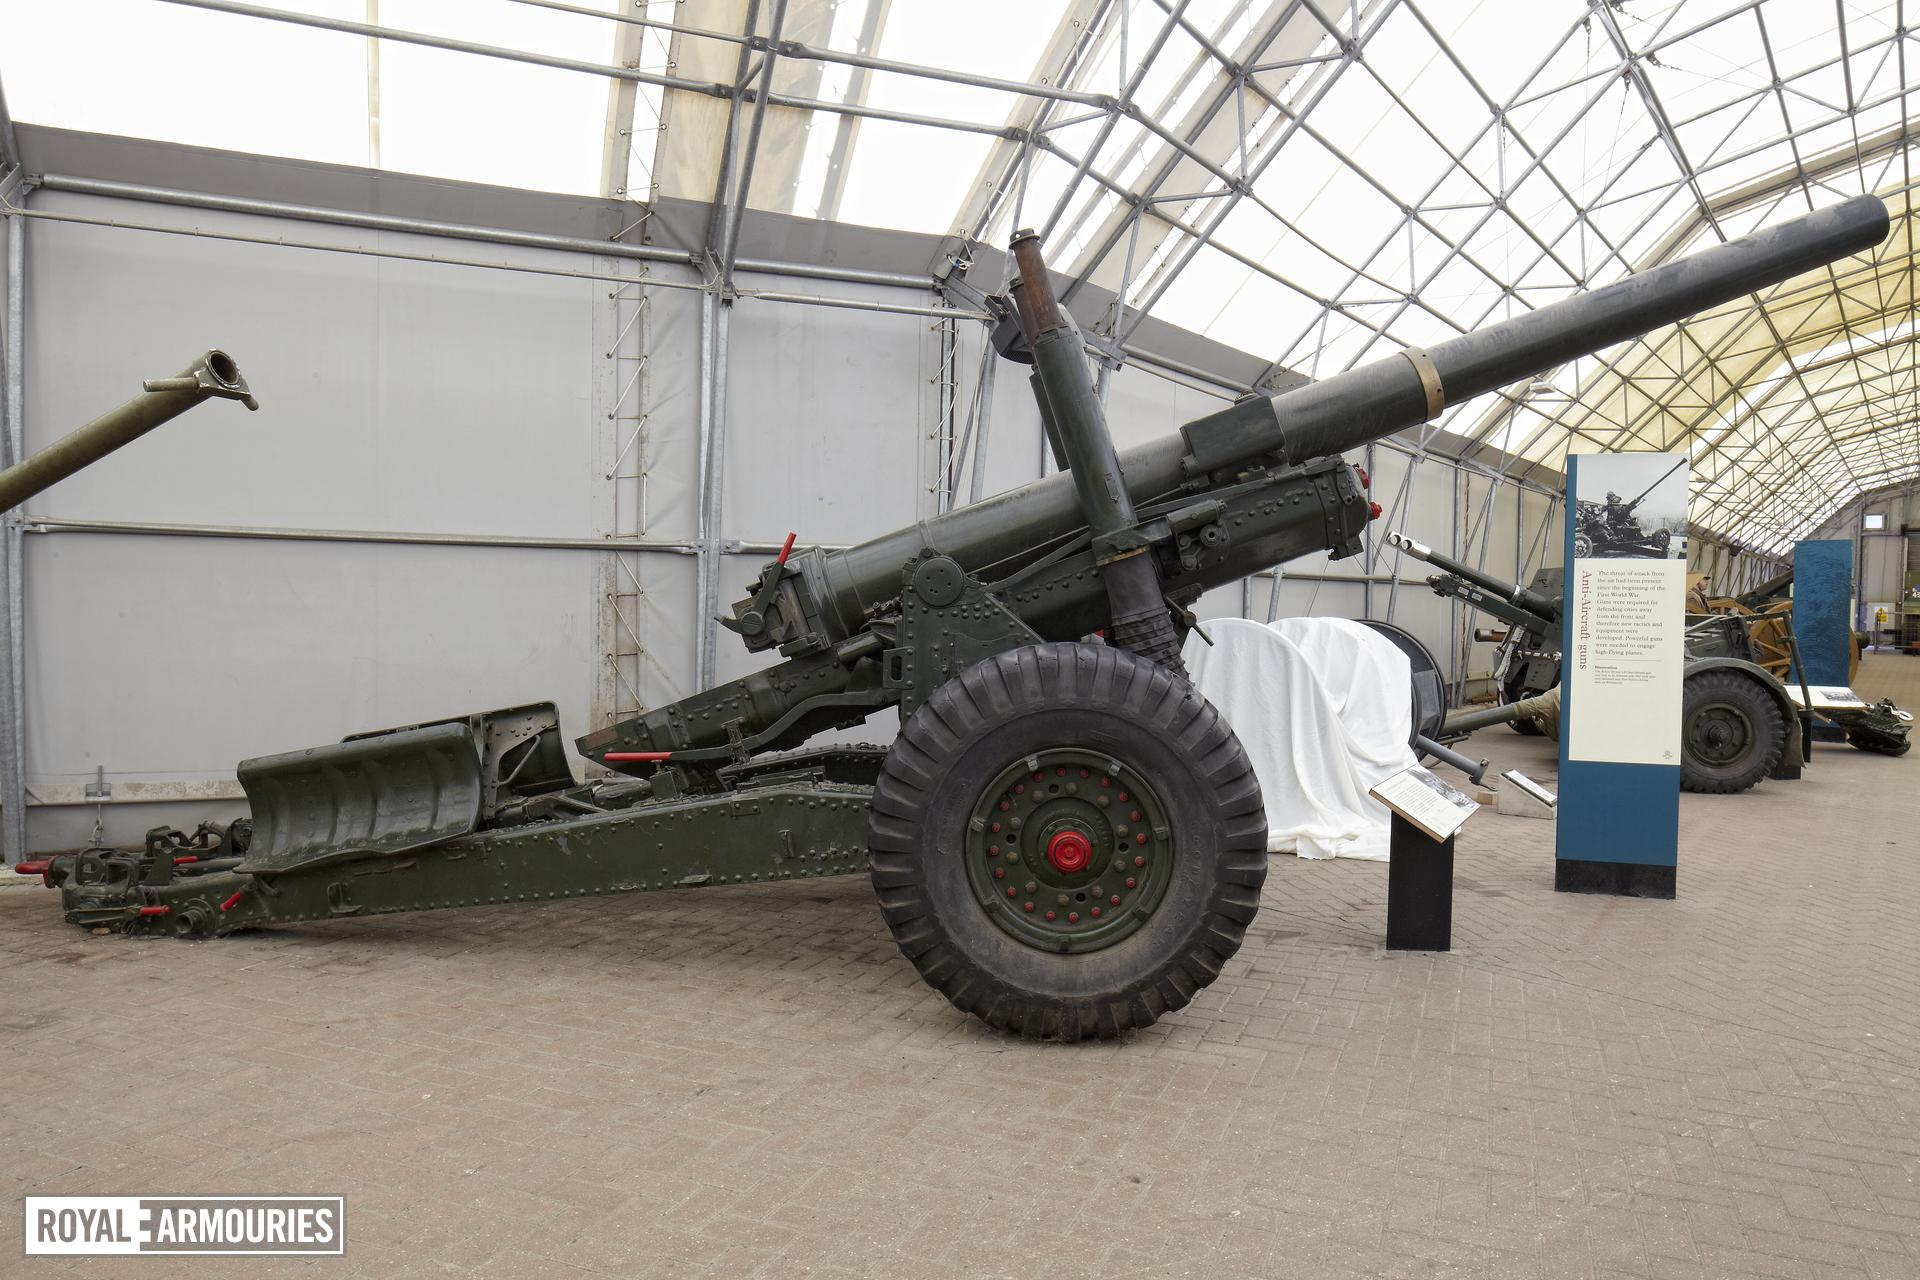 5.5 in medium gun and carriage